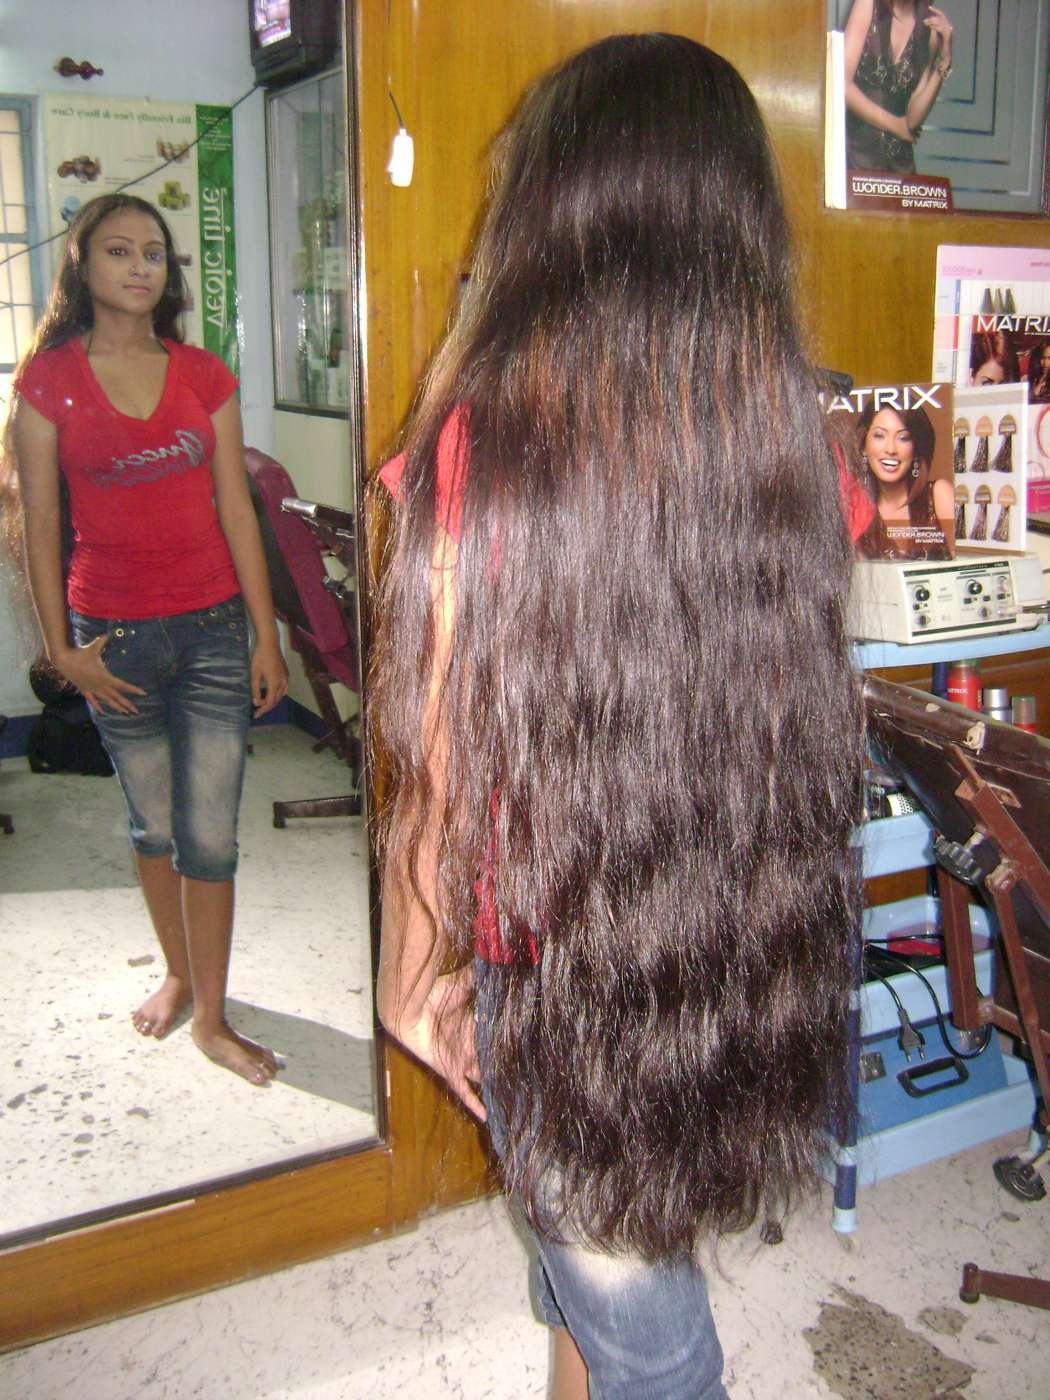 Updos For Long Thick Hair - Rakhi - 1 - Indianrapunzels.com